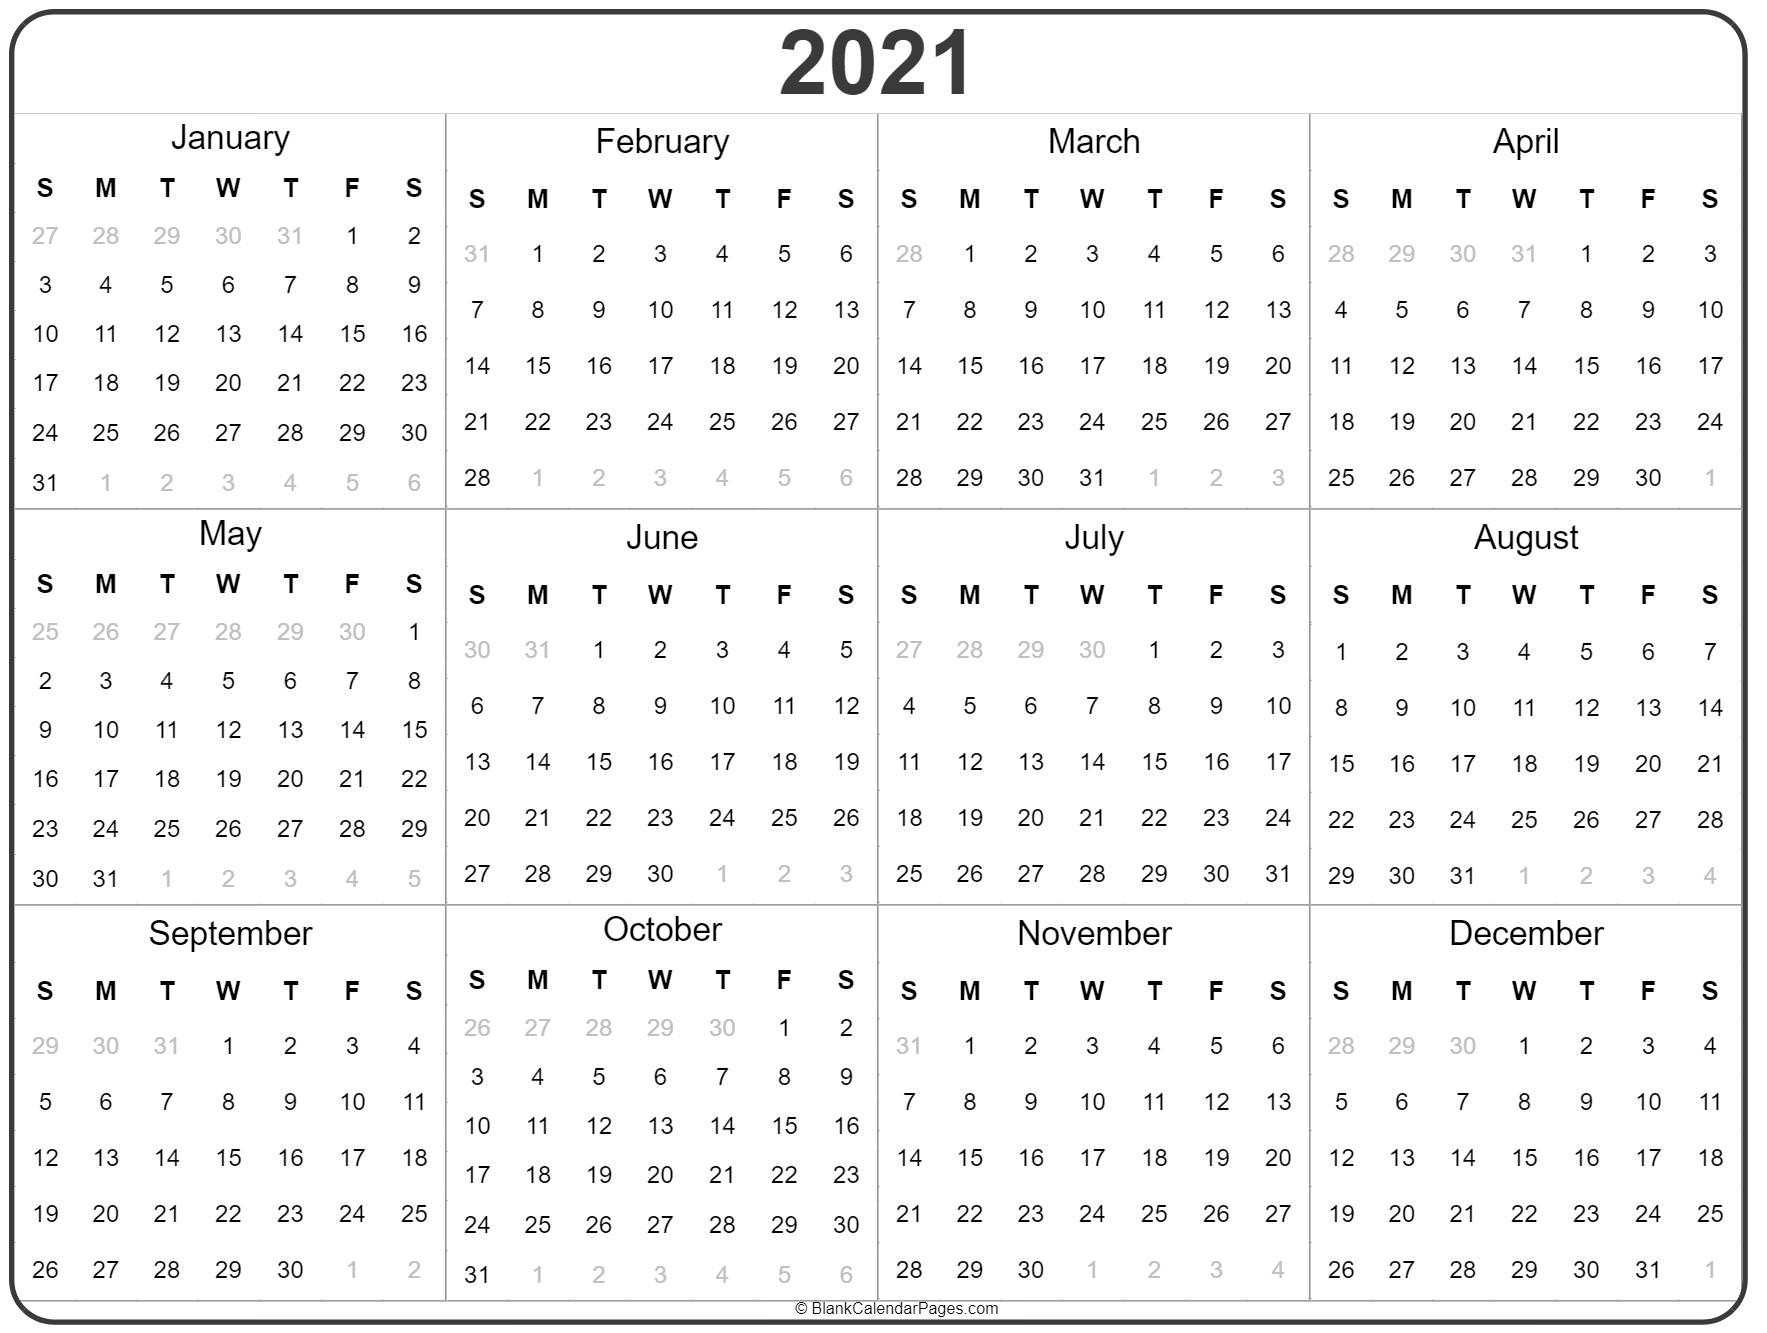 2021 Year Calendar | Yearly Printable  2021 Calendar Printable One Page Free